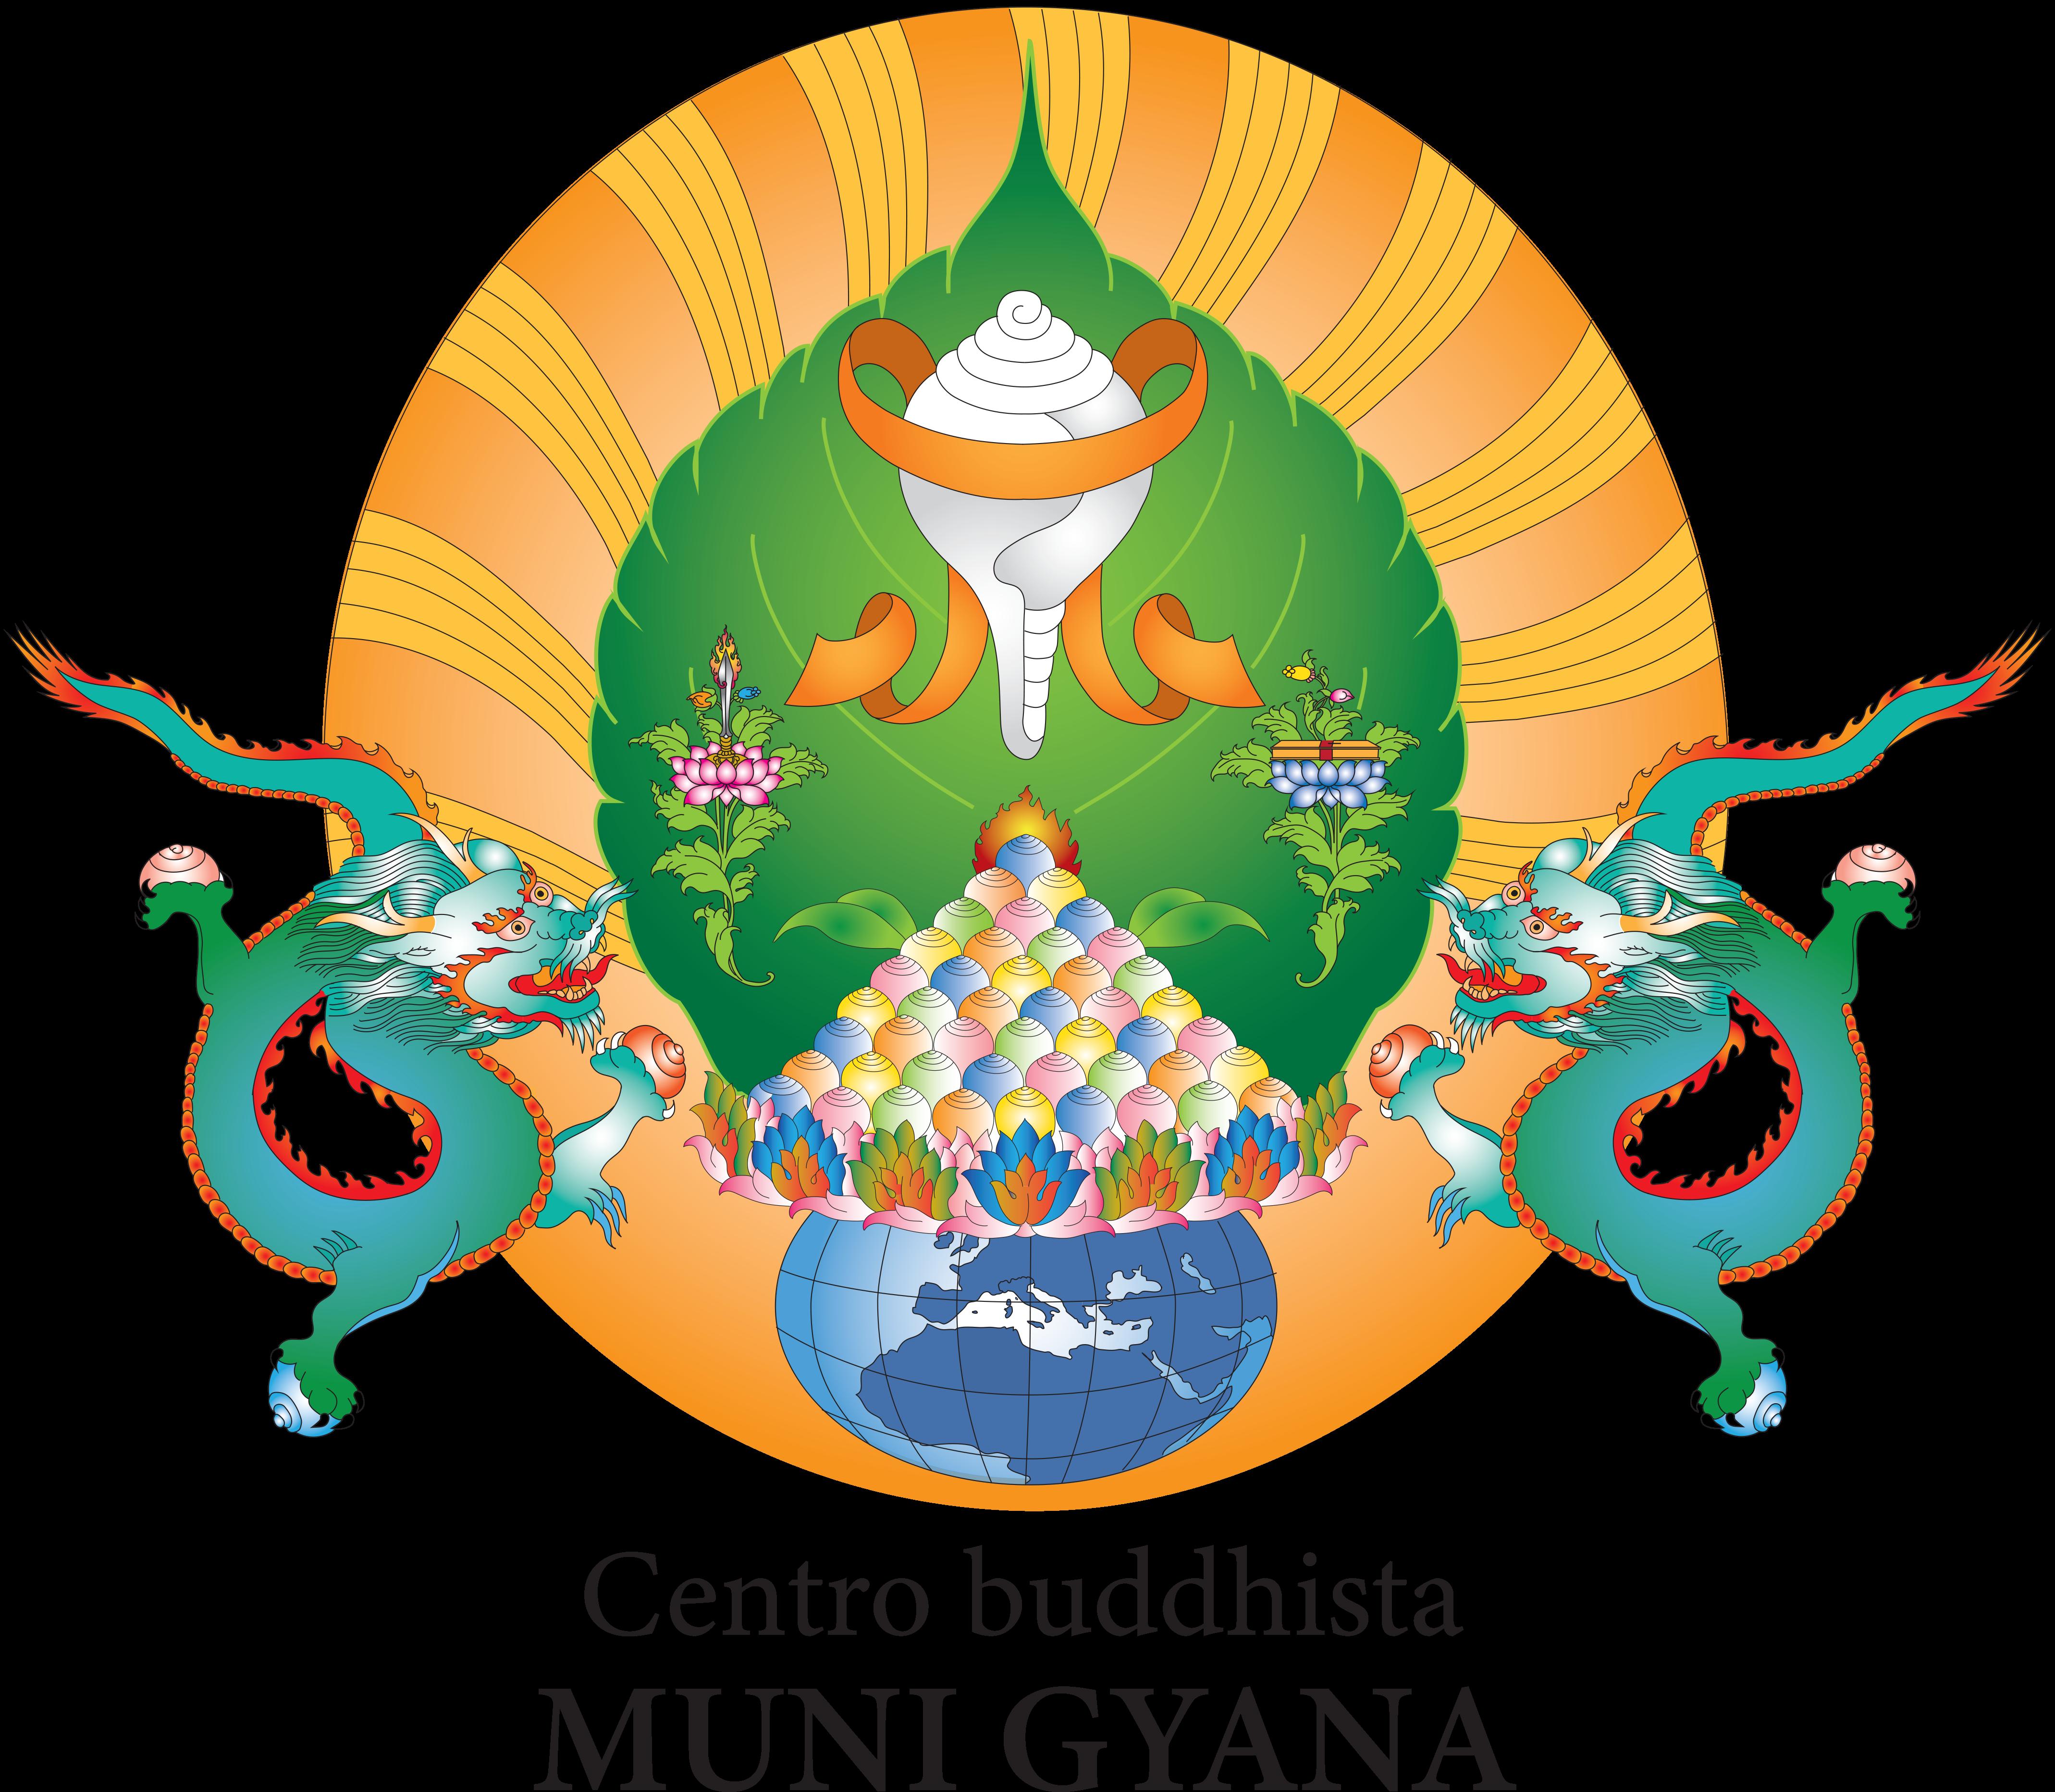 Centro Buddhista Muni Gyana